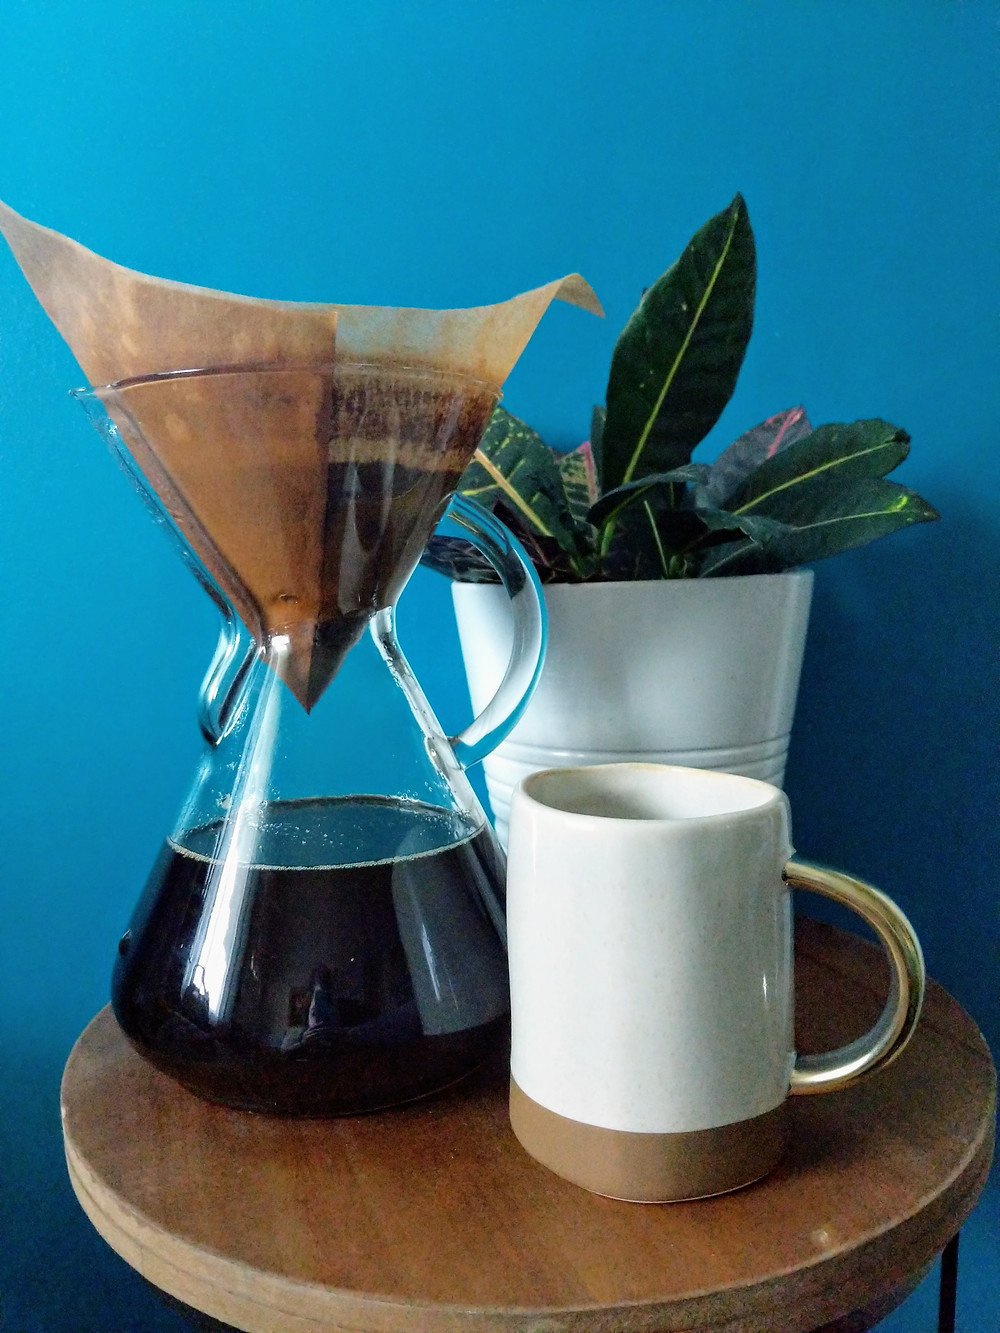 Chemex brewed coffee